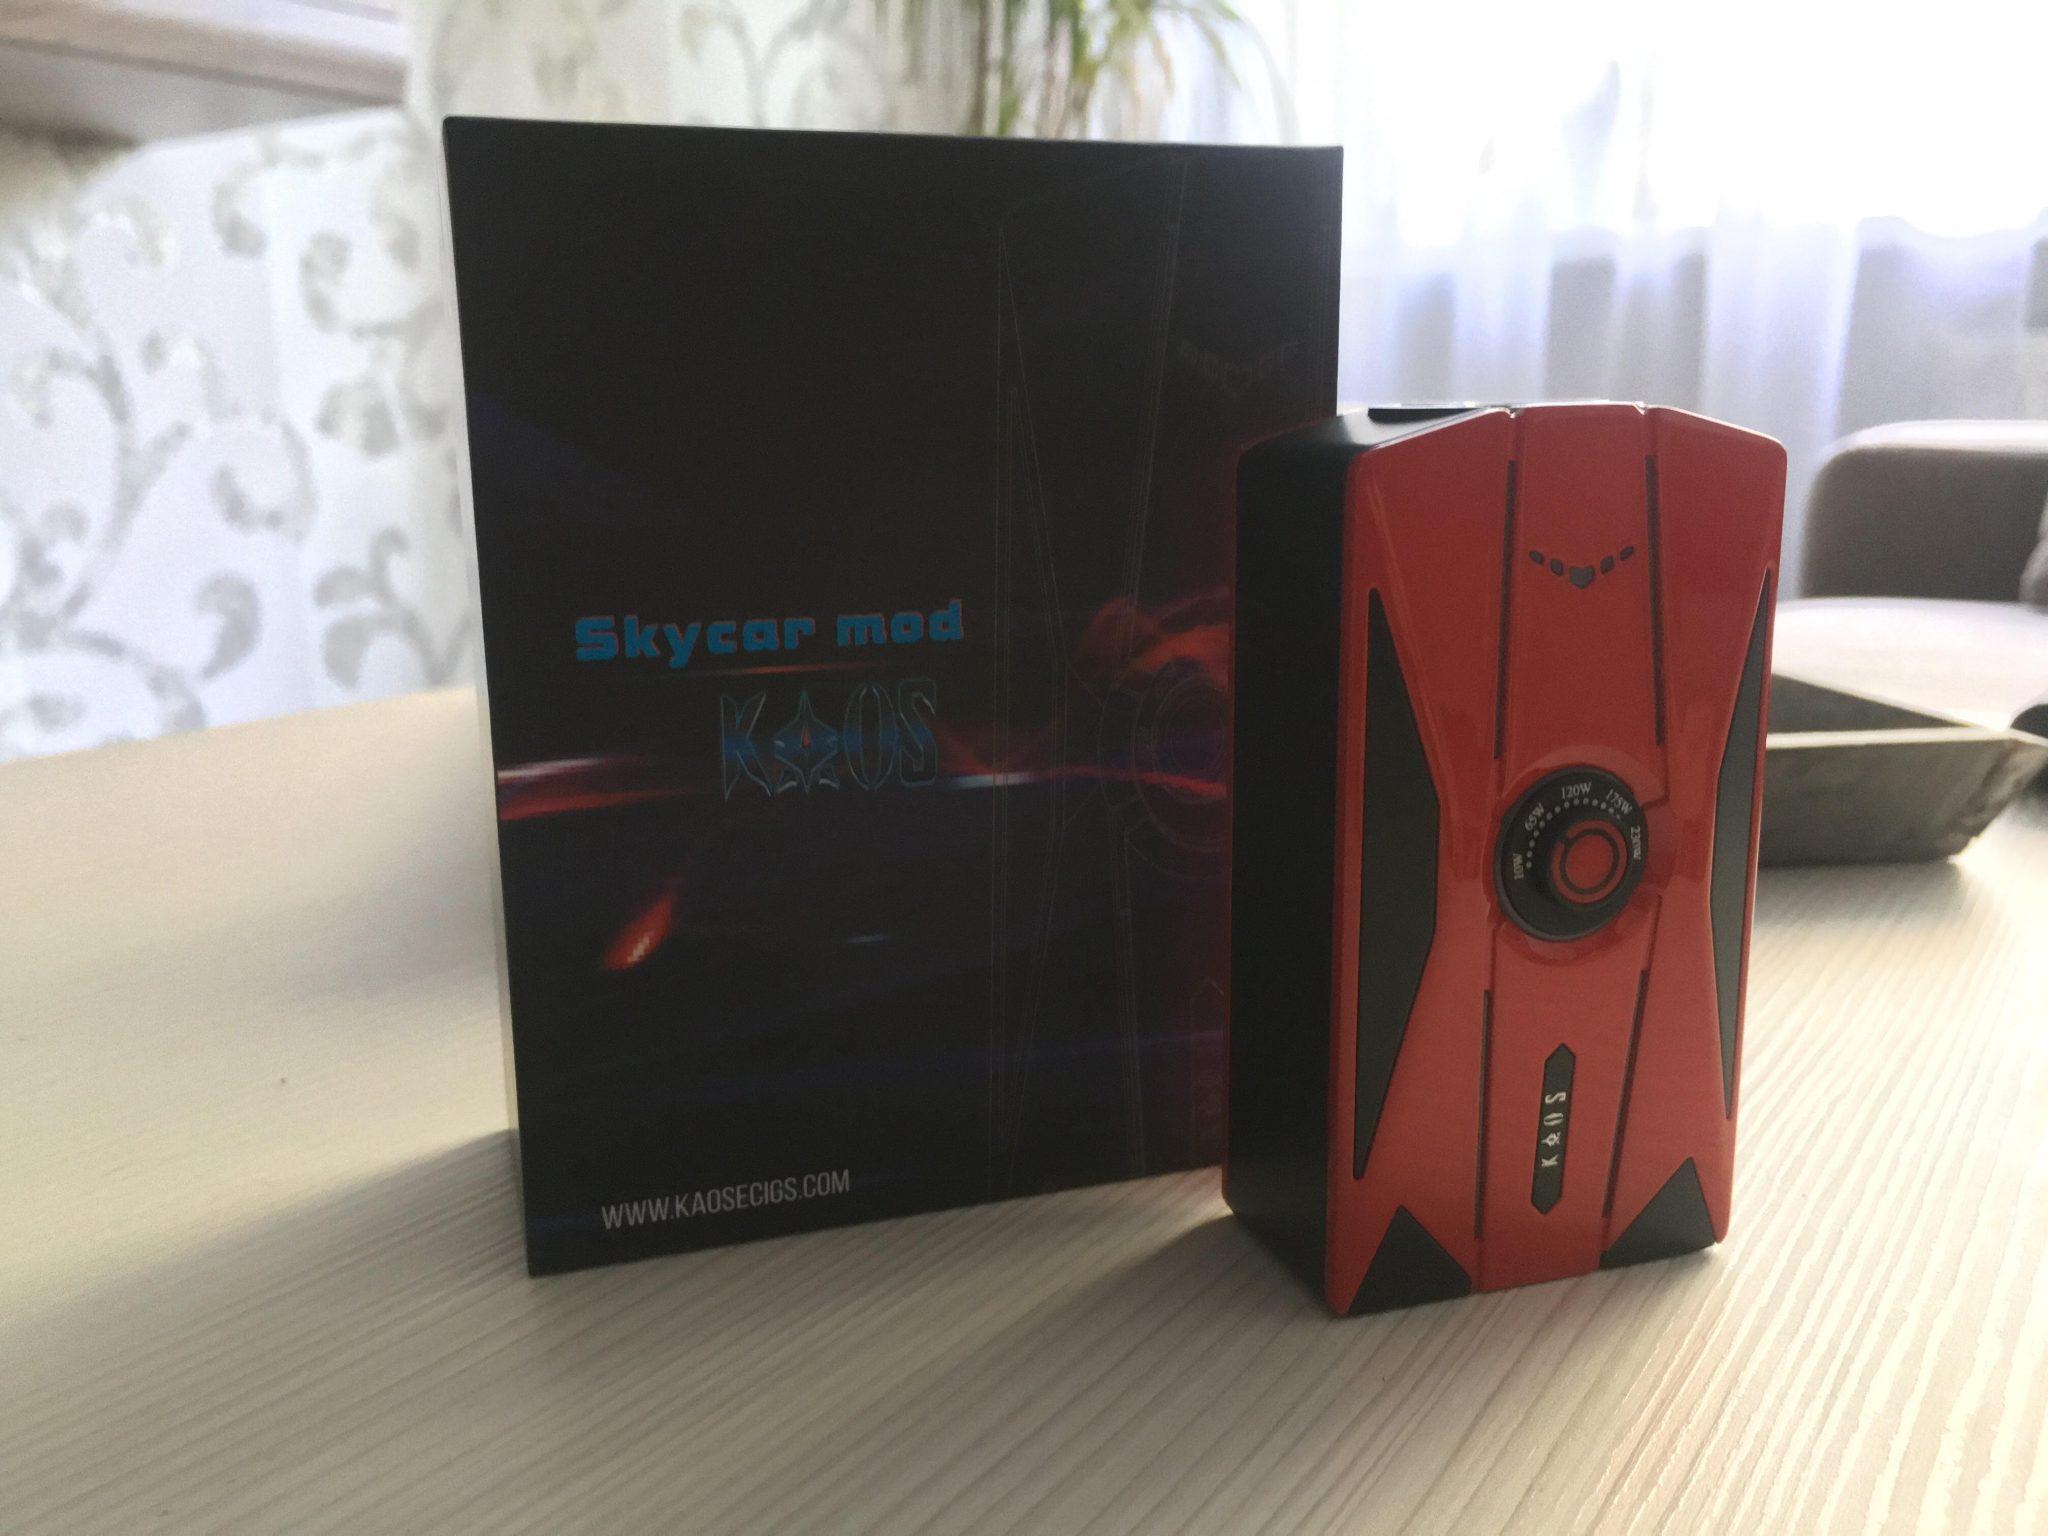 Sigelei Kaos Skycar Review